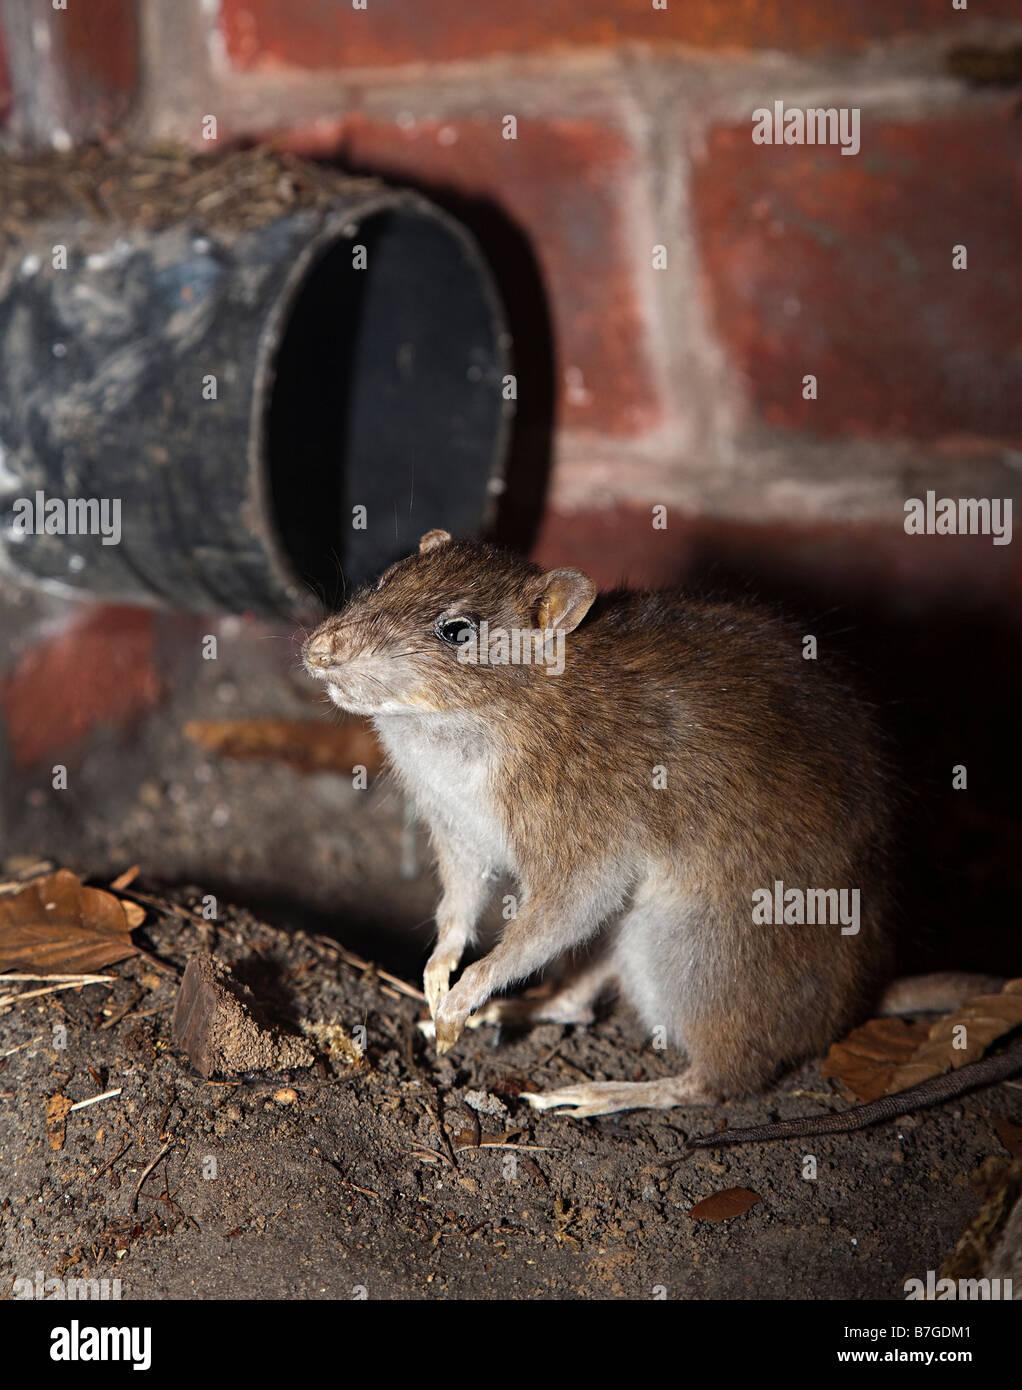 Brown rat Rattus norvegicus and pipe - Stock Image